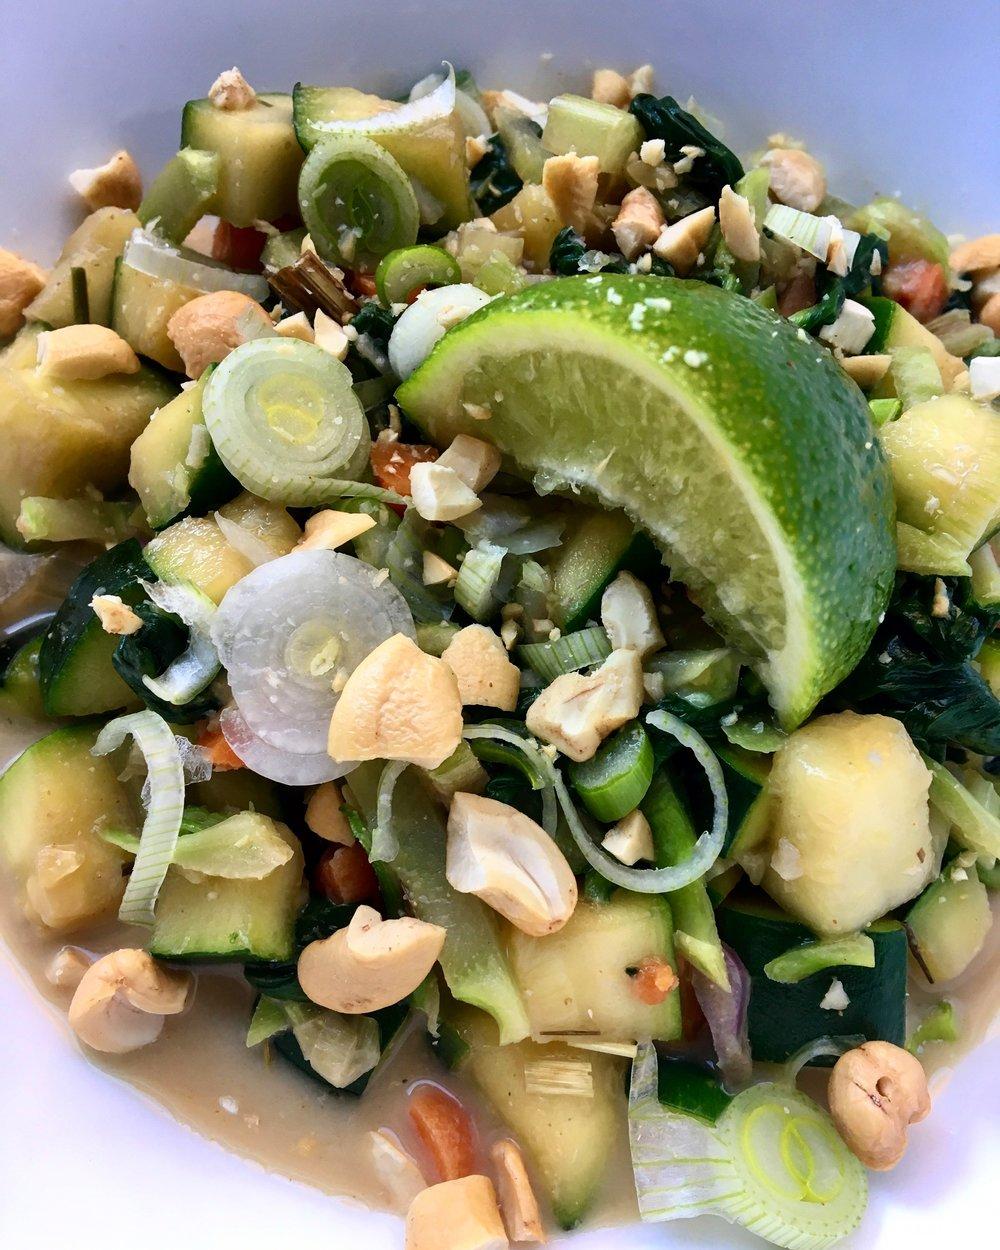 12 Minute Meal / Veggies in Coconut Milk